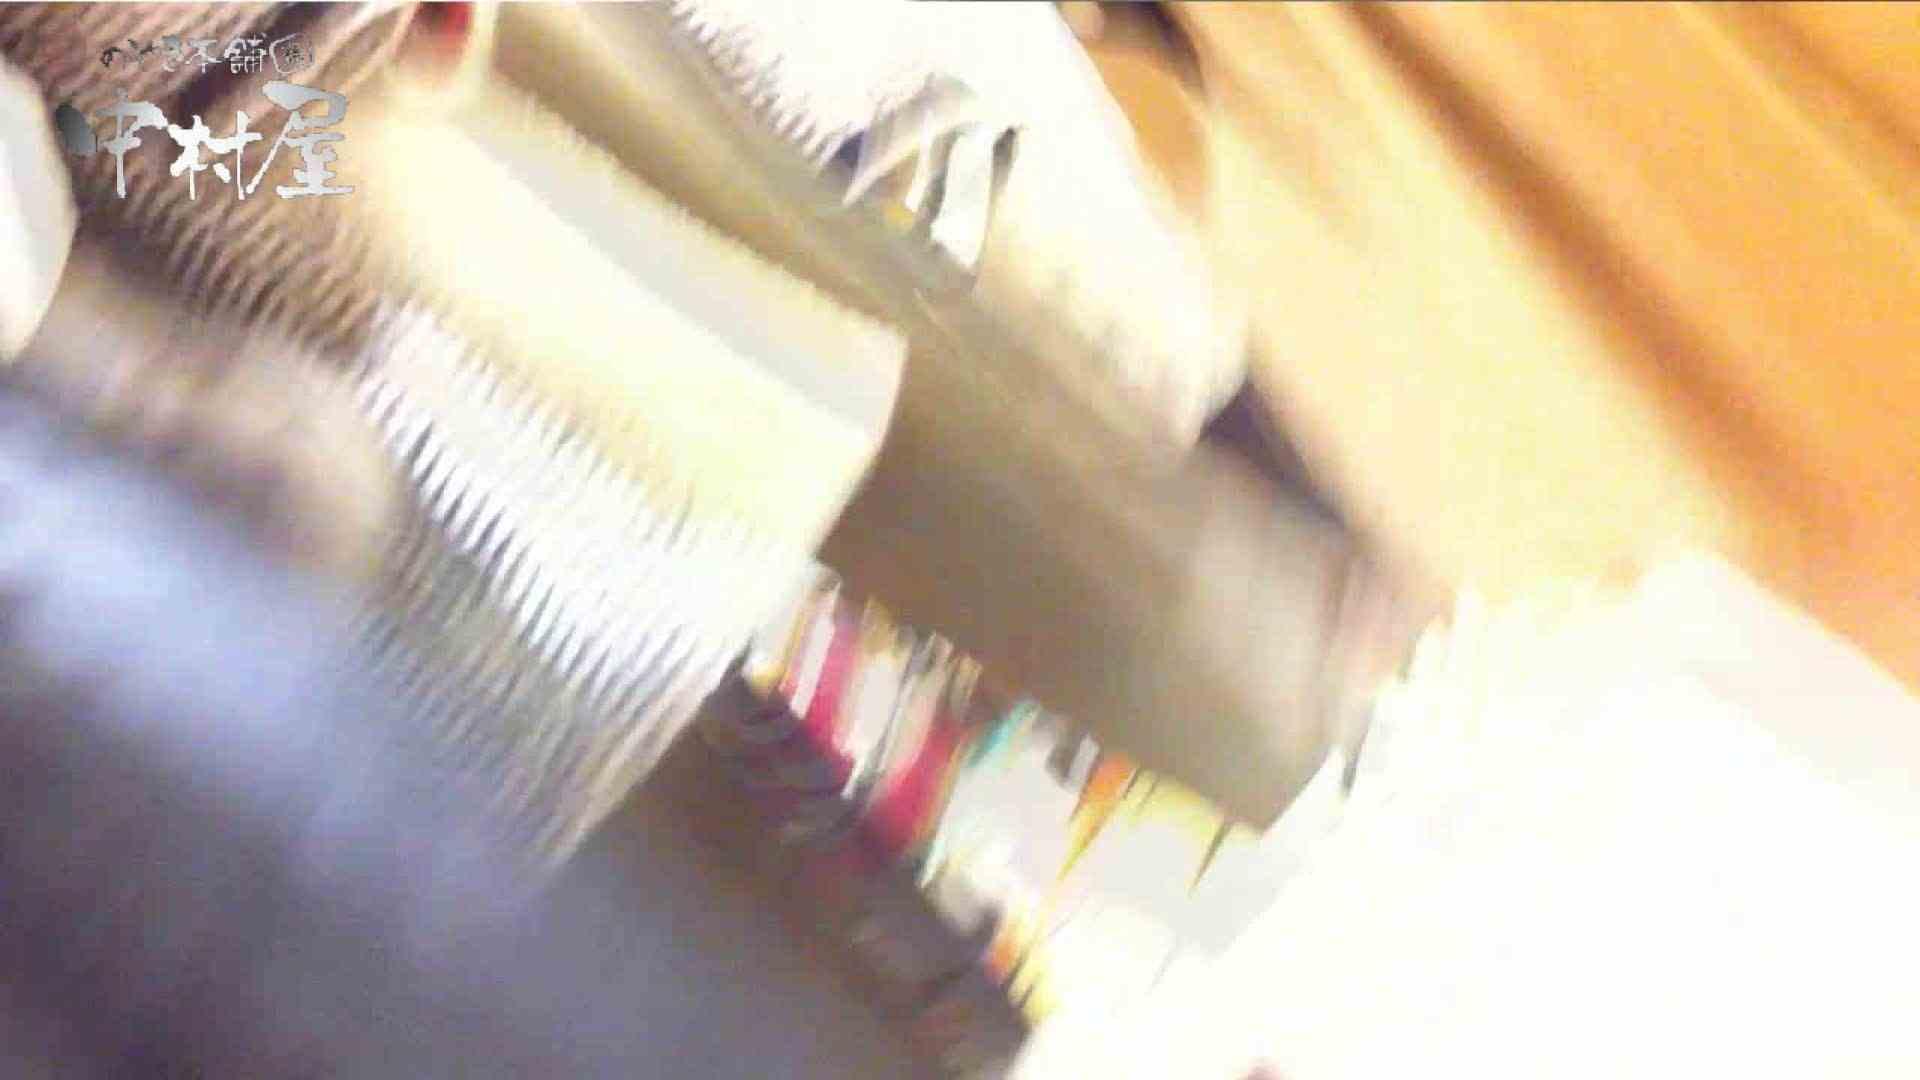 vol.65 美人アパレル胸チラ&パンチラ ムッチリ感がいい感じ花がらパンツさん チラ  106連発 15